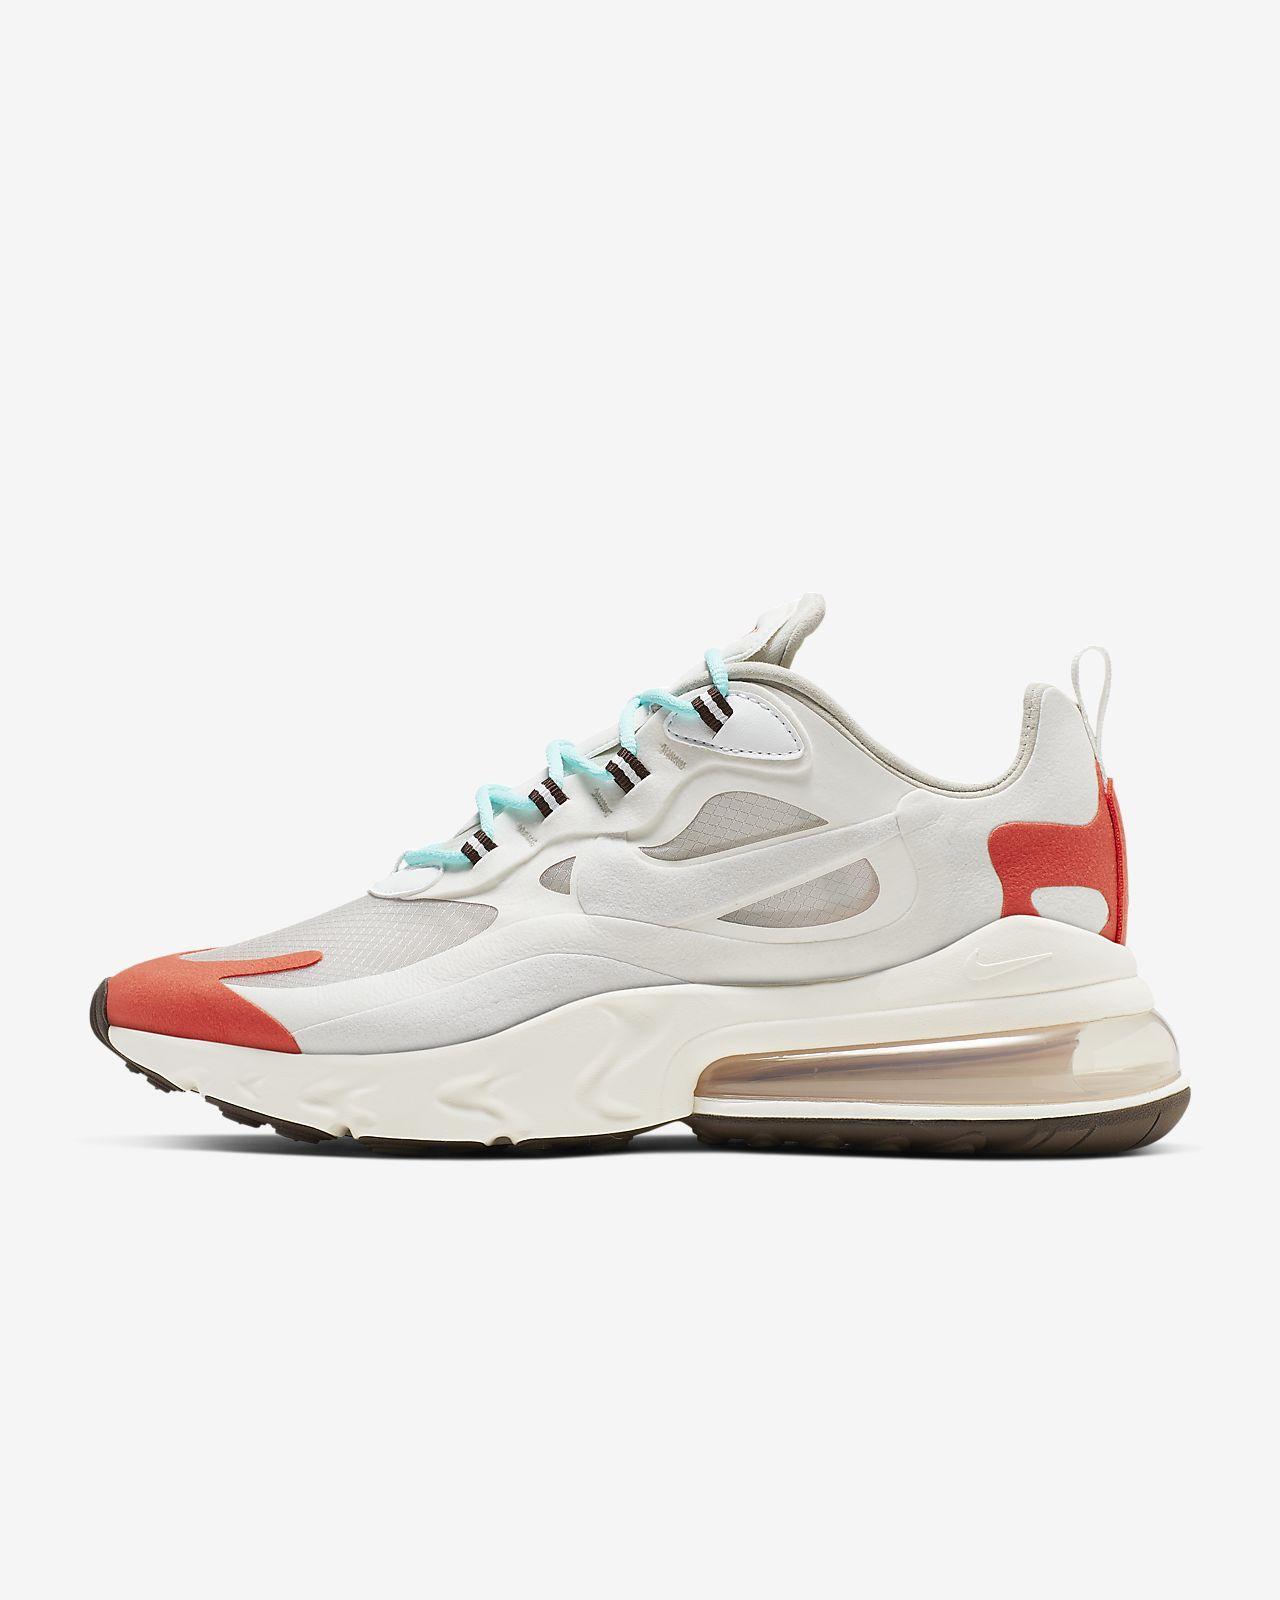 Nike Air Max 270 React (Mid-Century Art) Erkek Ayakkabısı